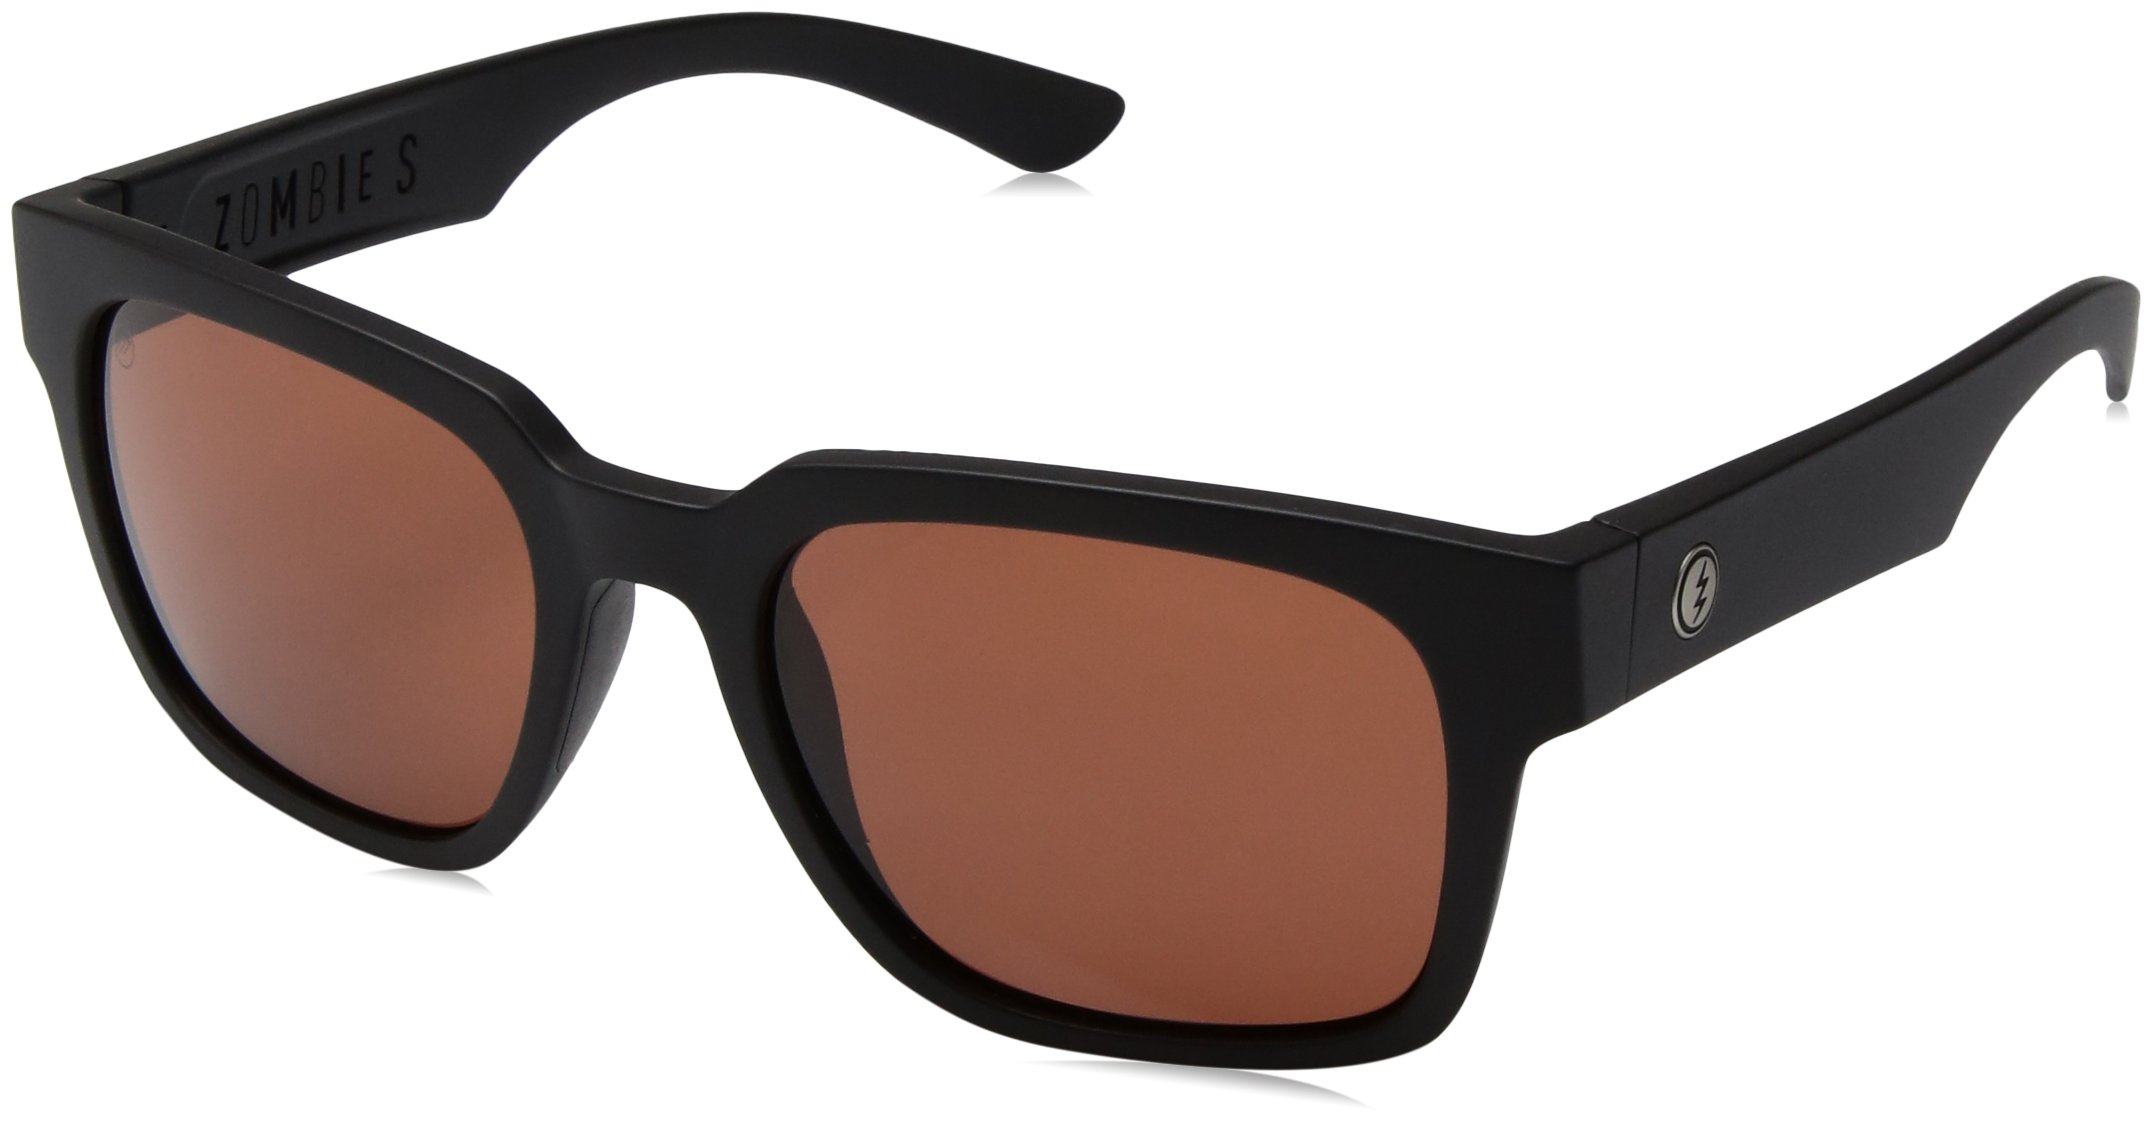 Electric Visual Zombie S Matte Black/OHM Rose Sunglasses